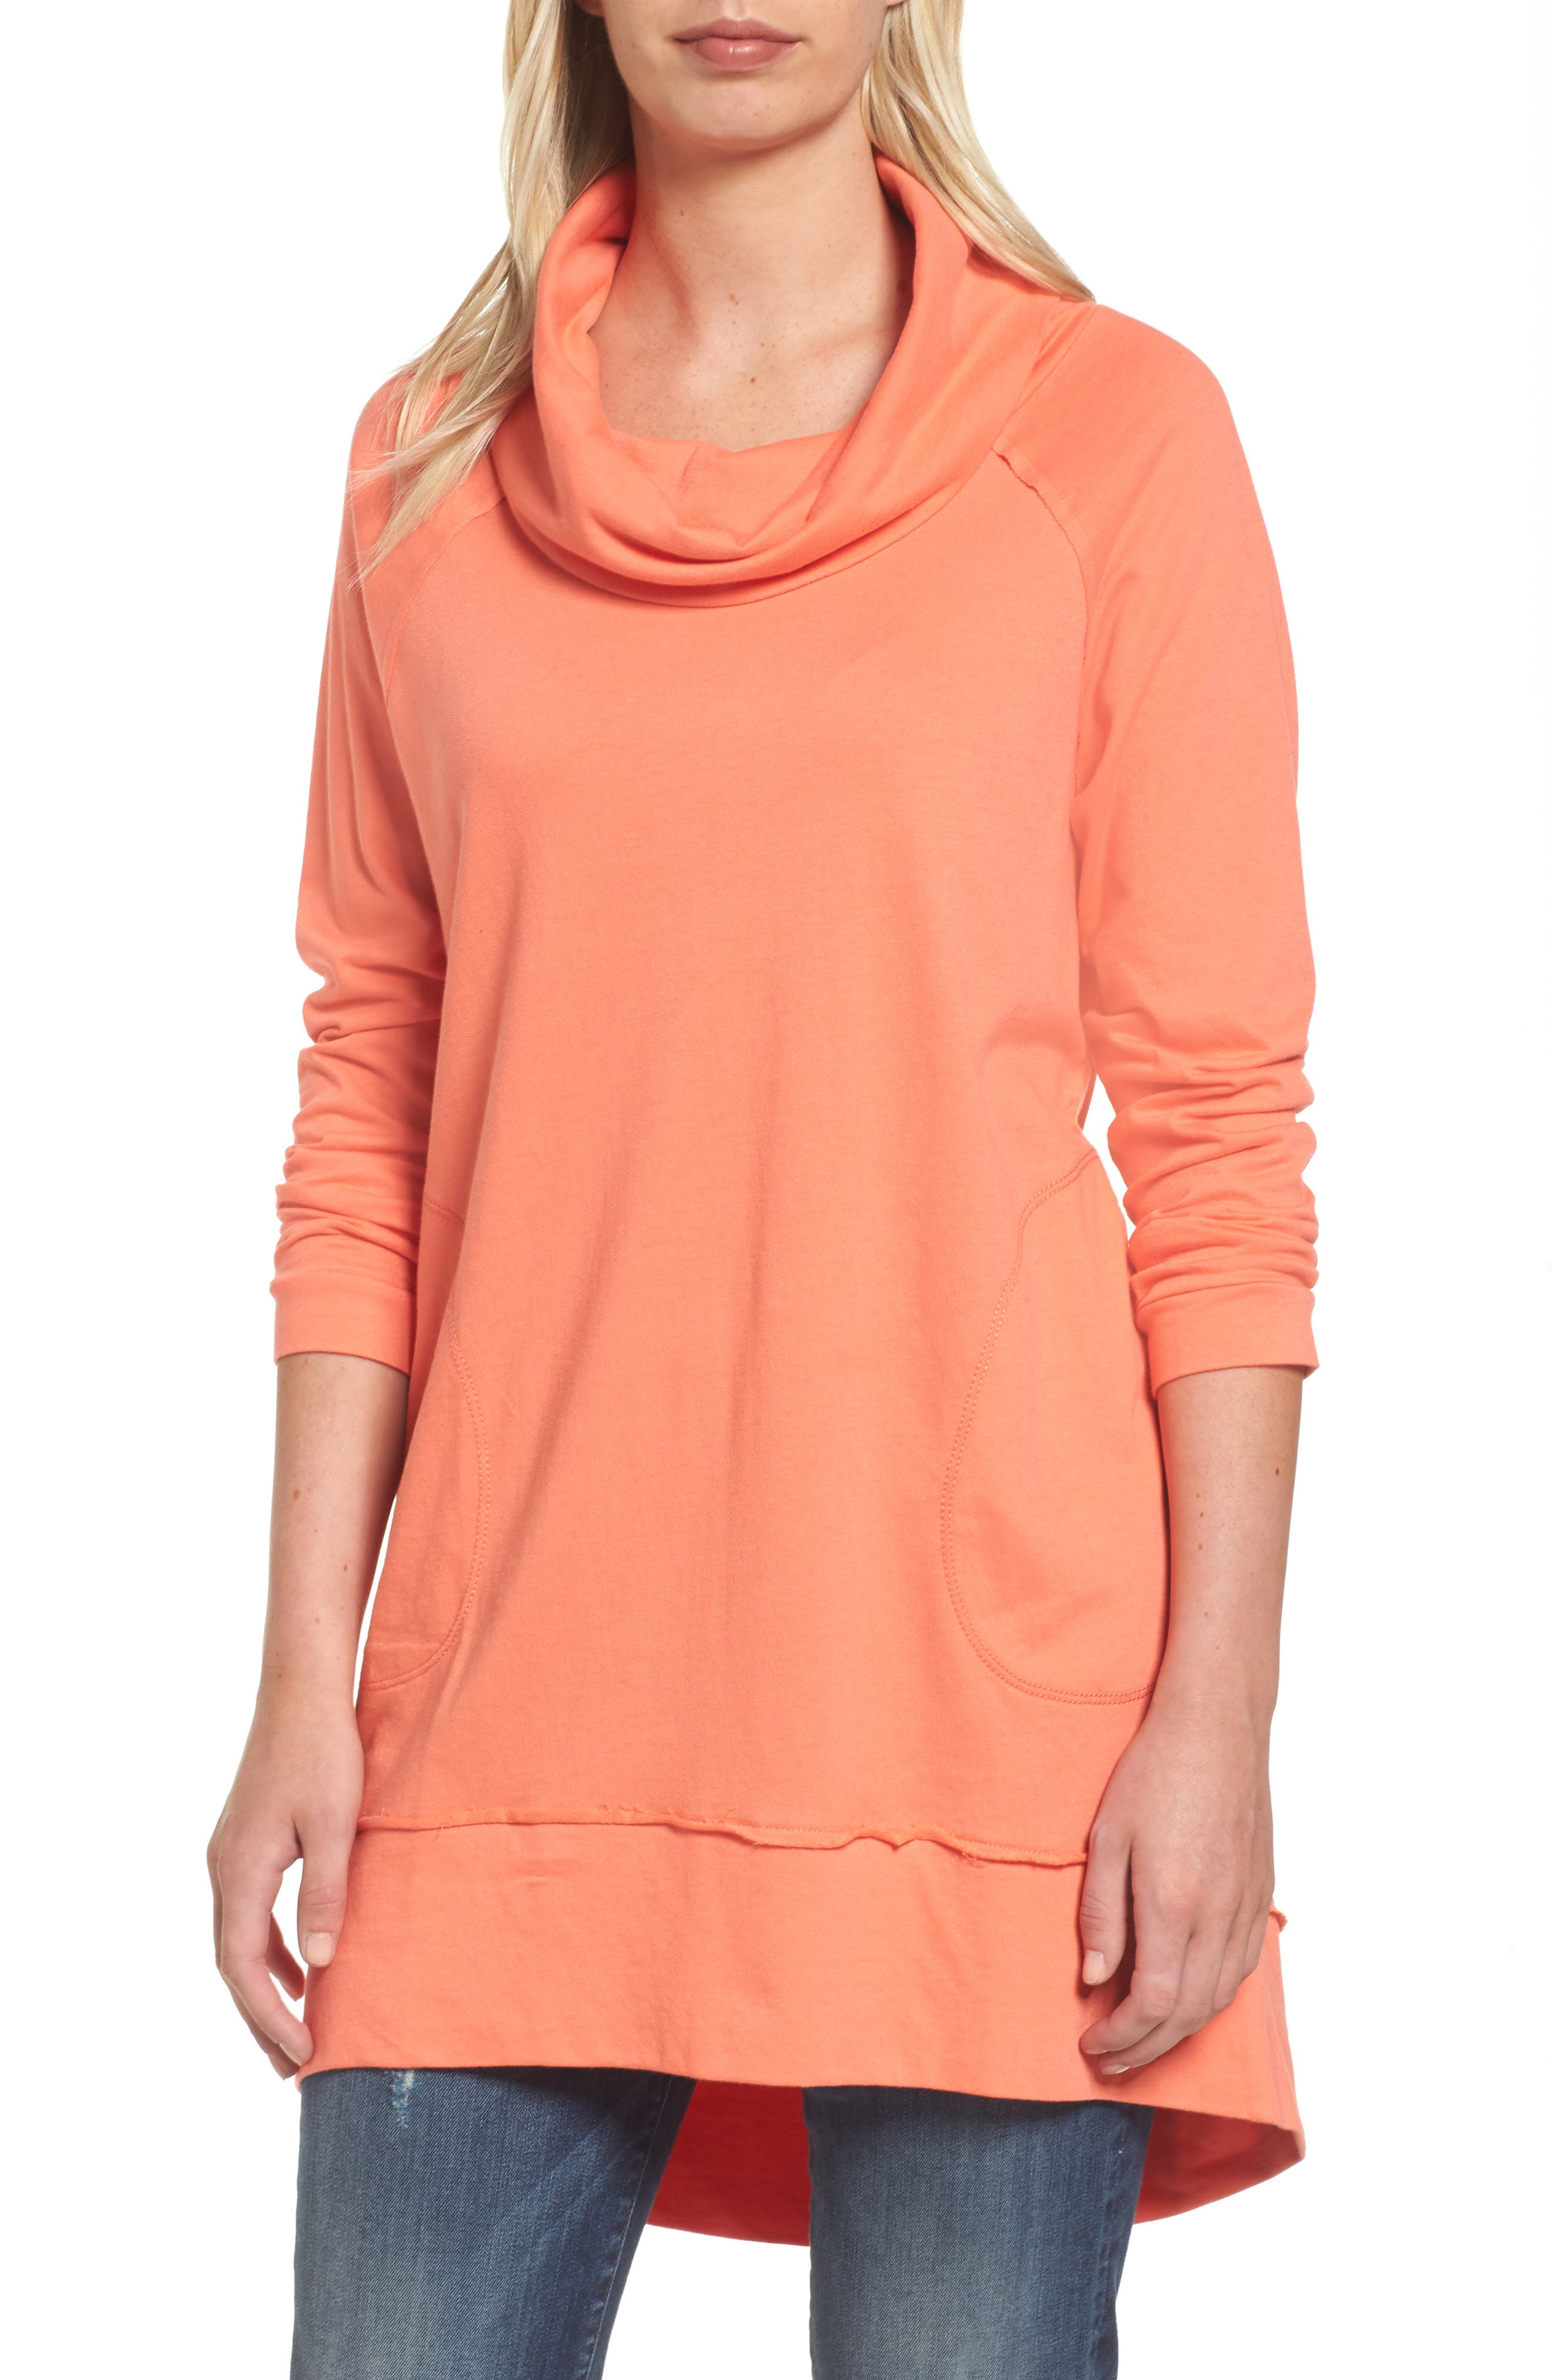 Alternate Image 1 Selected - Caslon® Cowl Neck Tunic Sweatshirt (Regular & Petite)